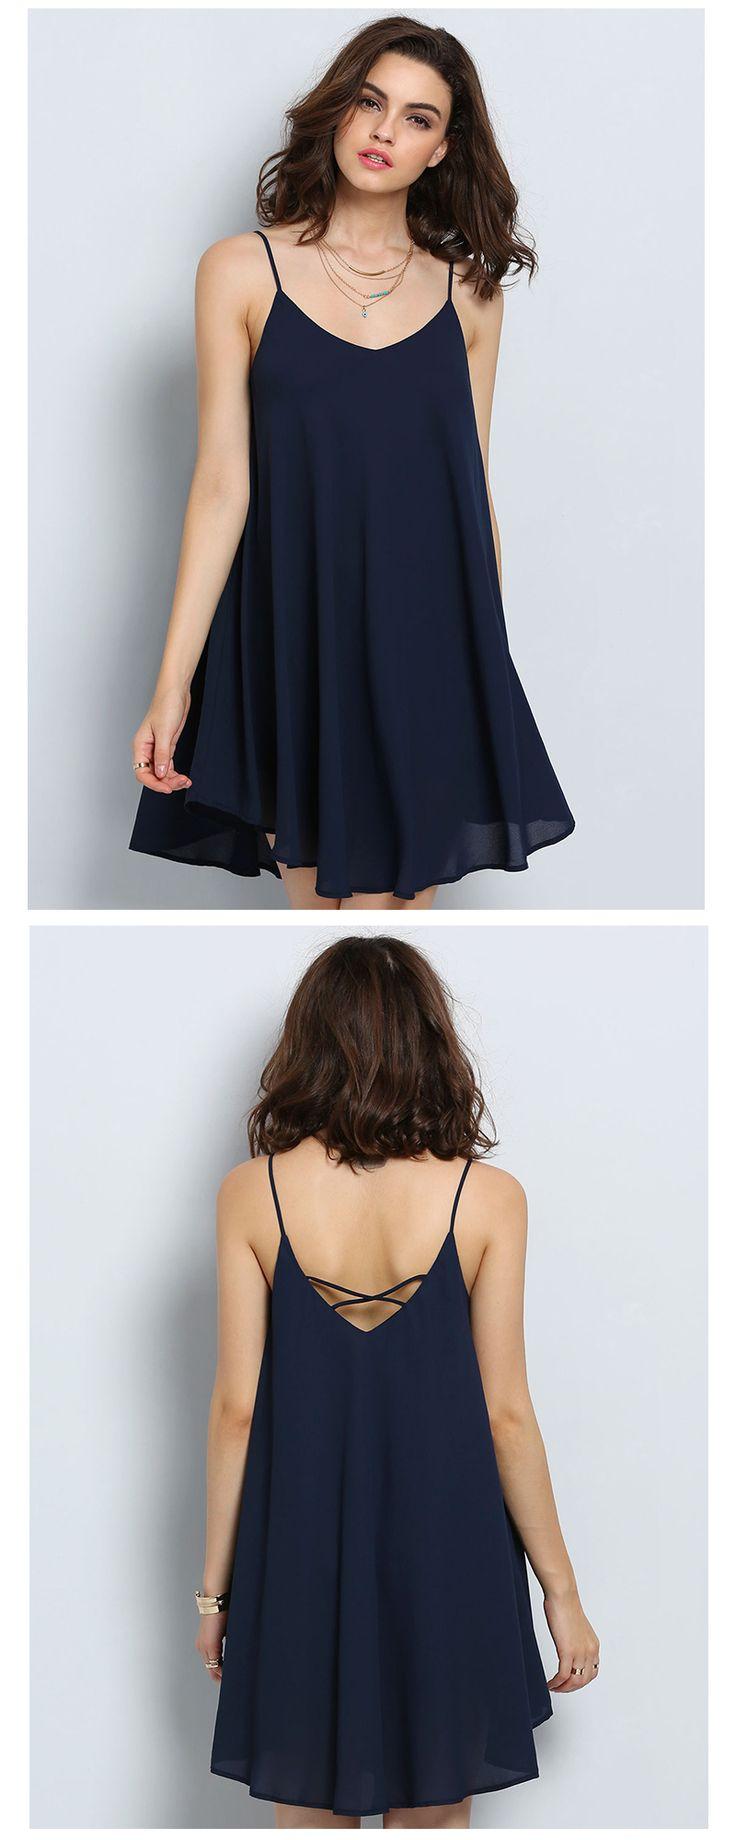 simple dresses criss cross back asymmetrical cami dress JMCVOEY